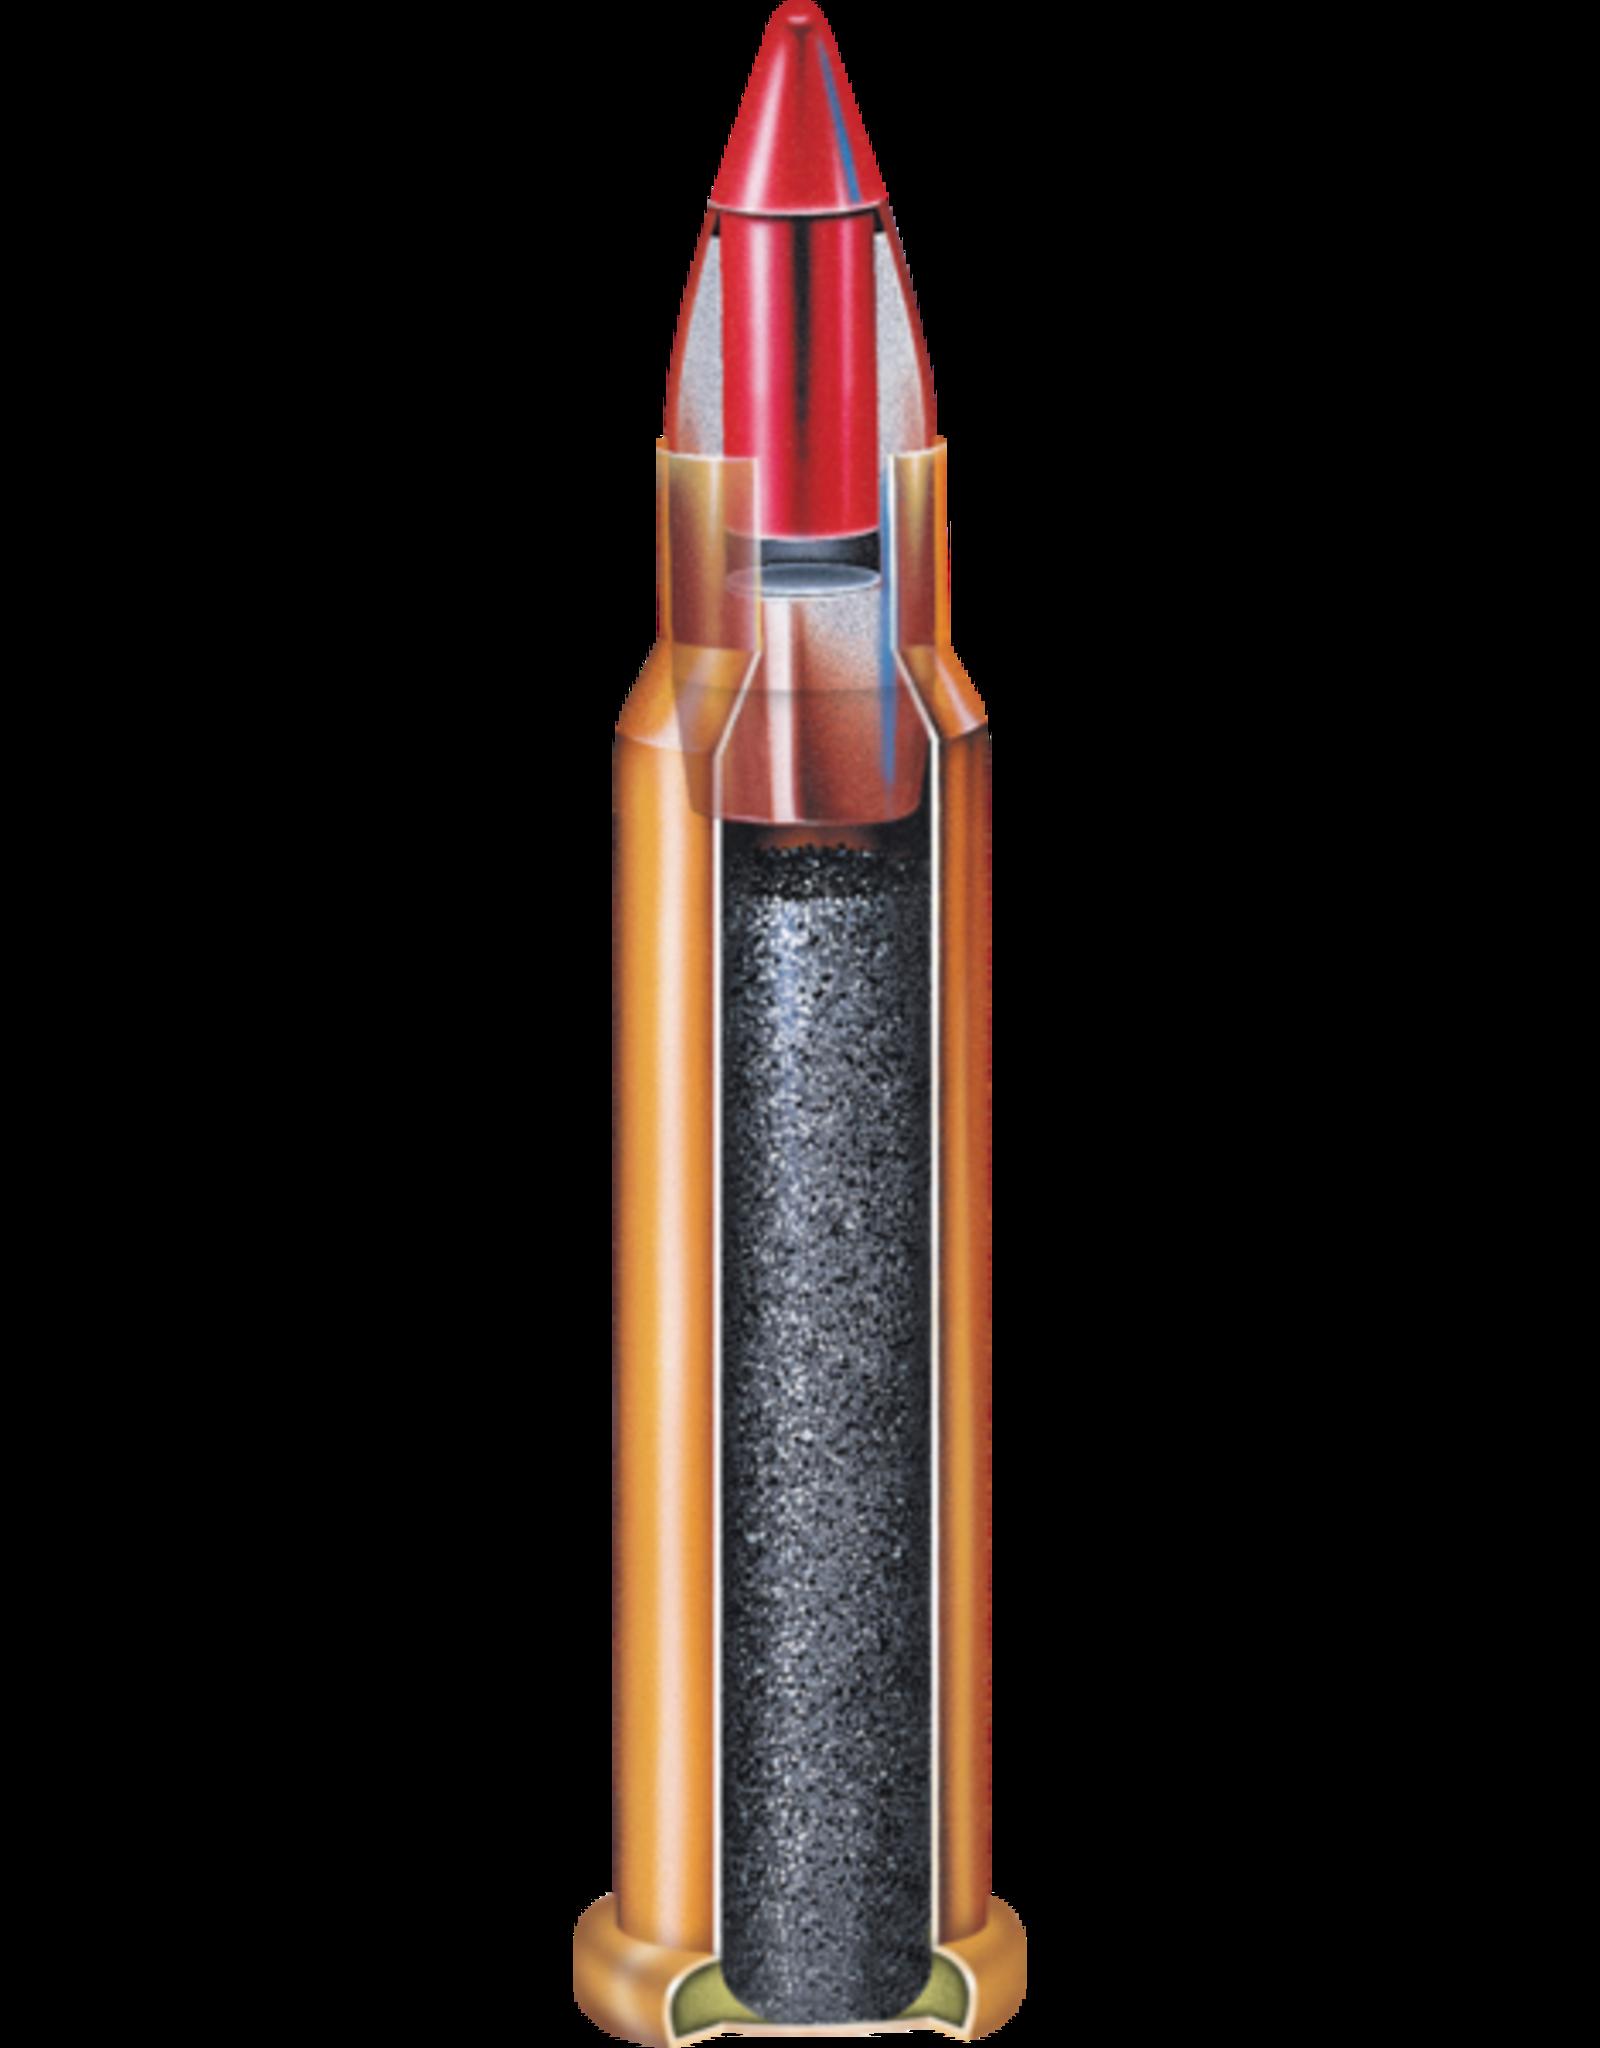 HORNADY - AMMO VARM.XPRESS 17HMR 17G V-MAX